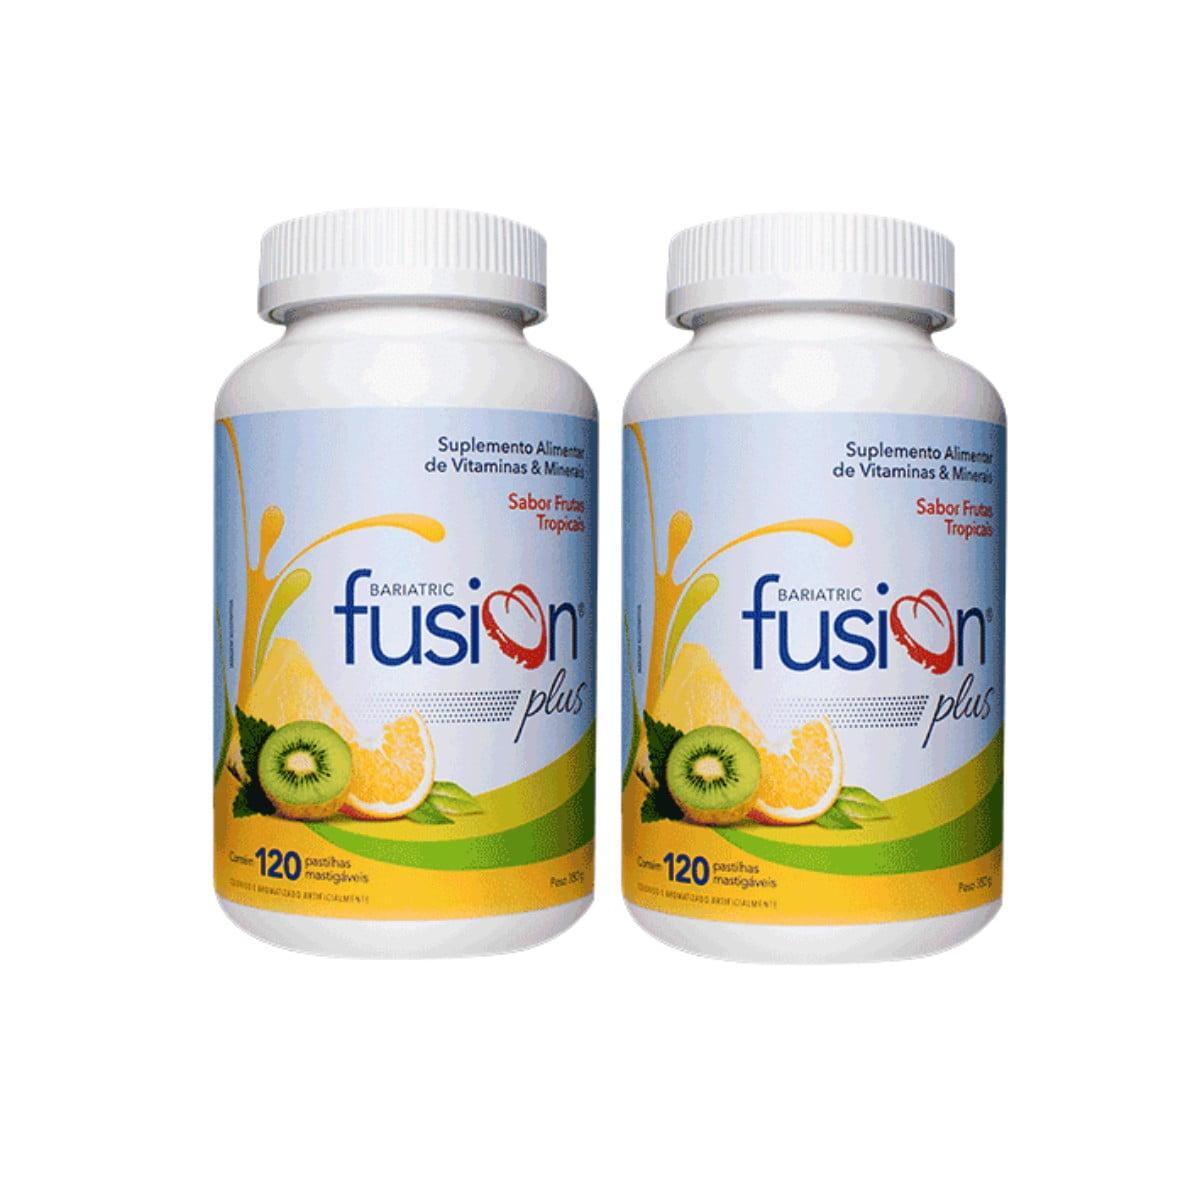 Kit c/2 Bariatric Fusion Plus 120 Pastilhas Mastigáveis - Sabor Frutas Tropicais